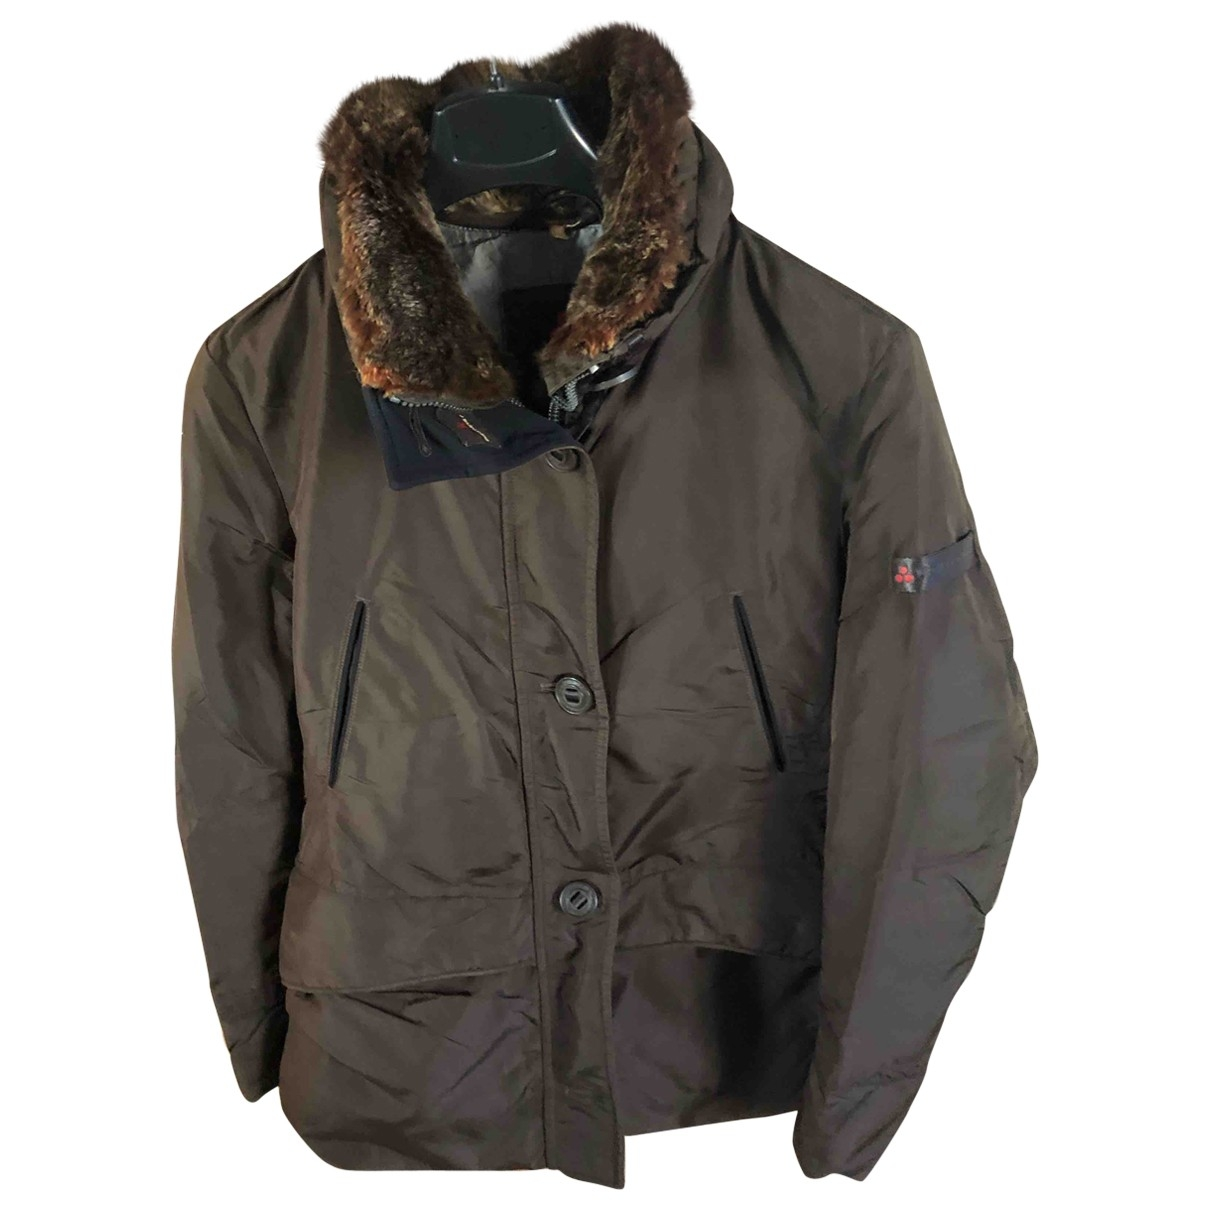 Peuterey \N Brown jacket for Women 46 IT